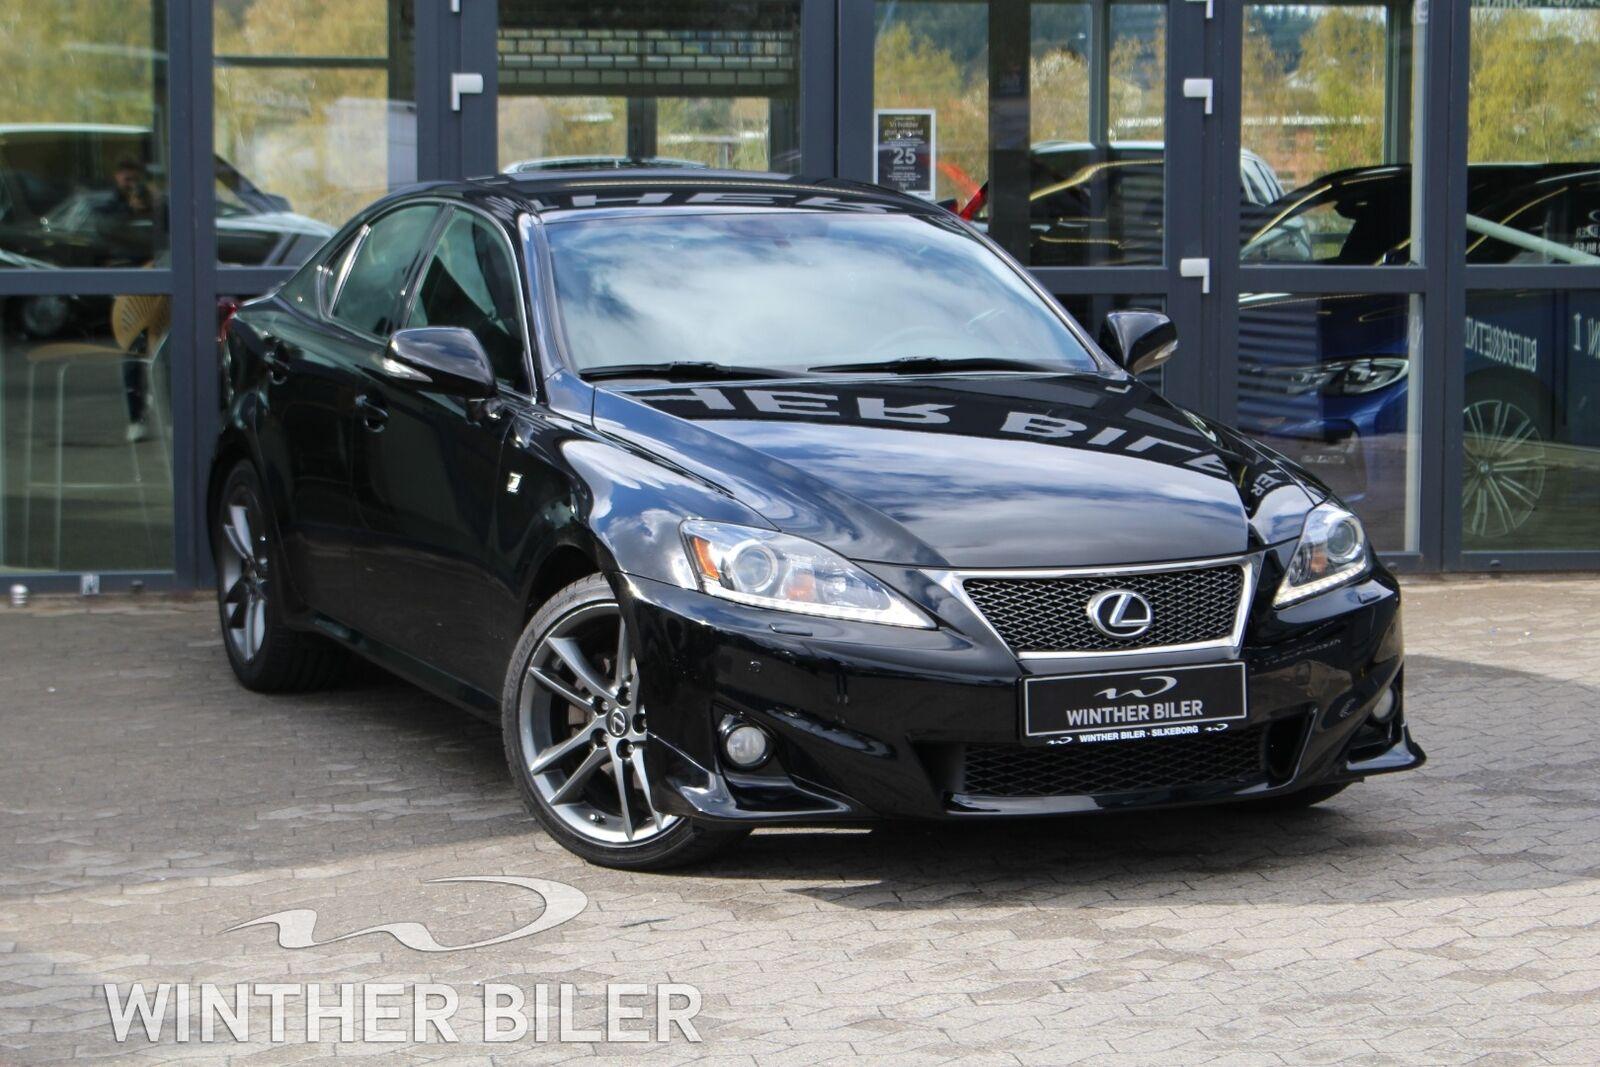 Lexus IS200d 2,2 F Sport 4d - 139.900 kr.